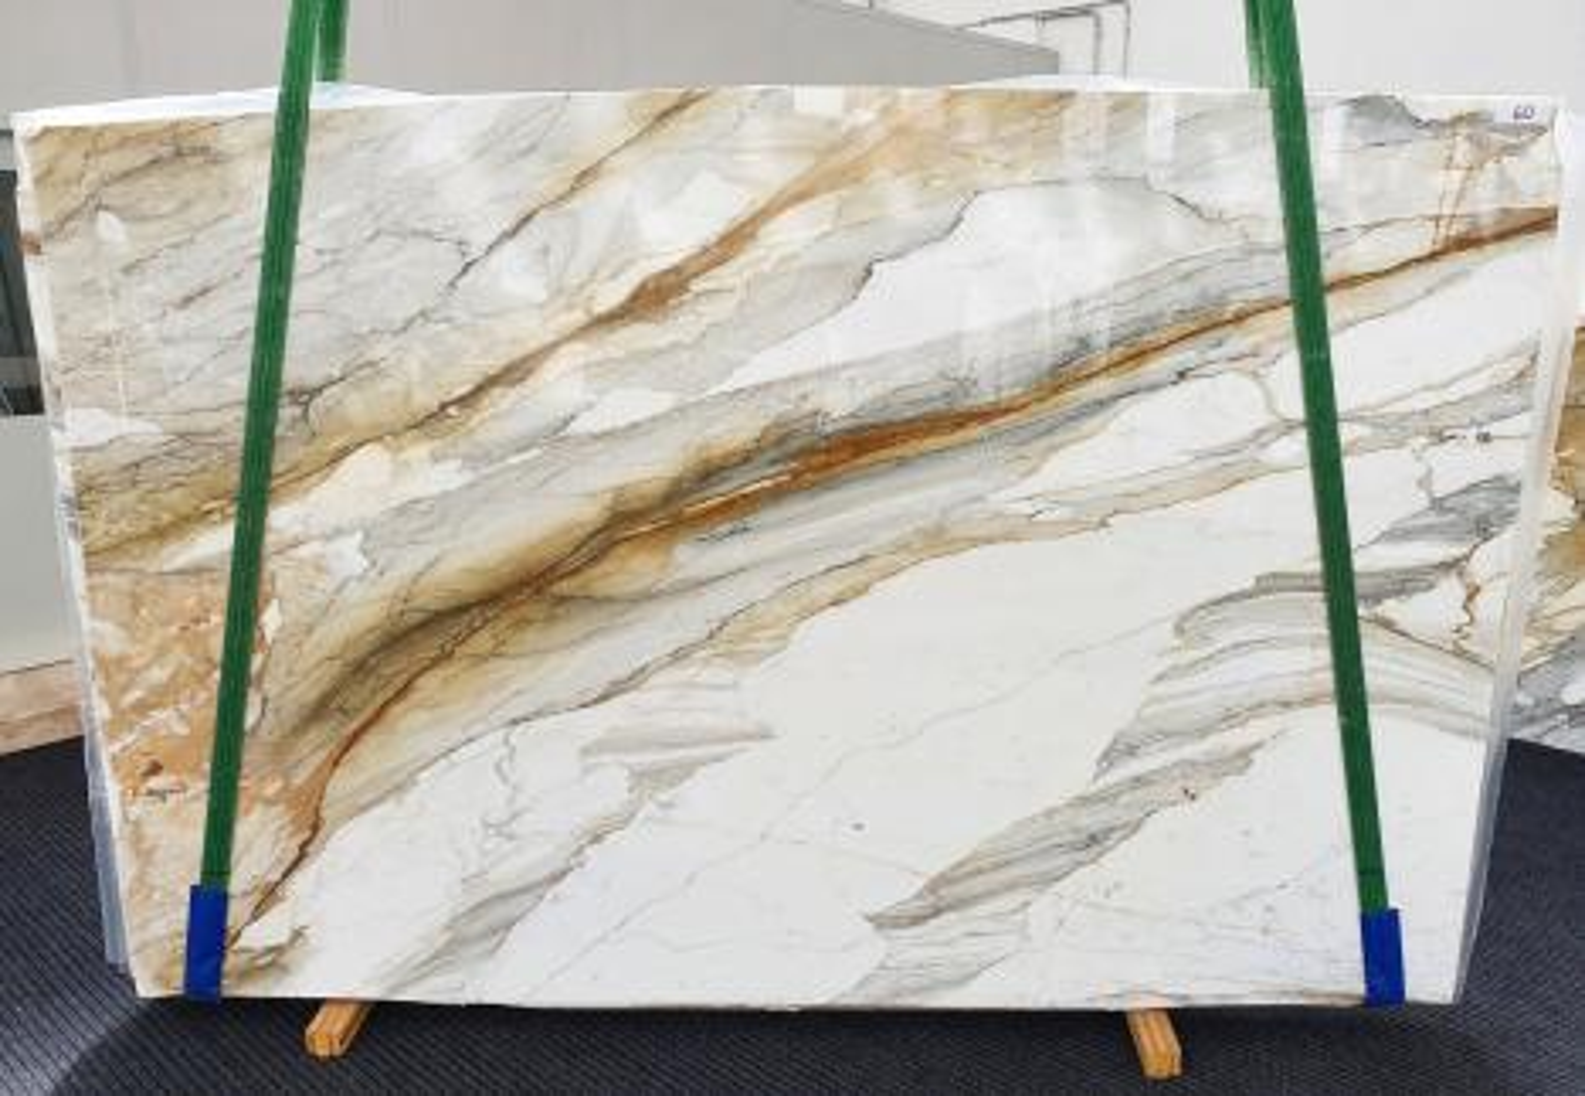 CALACATTA MACCHIAVECCHIA polierte Unmaßplatten 1354 aus Natur Marmor , Slab #60: Lieferung Veneto, Italien